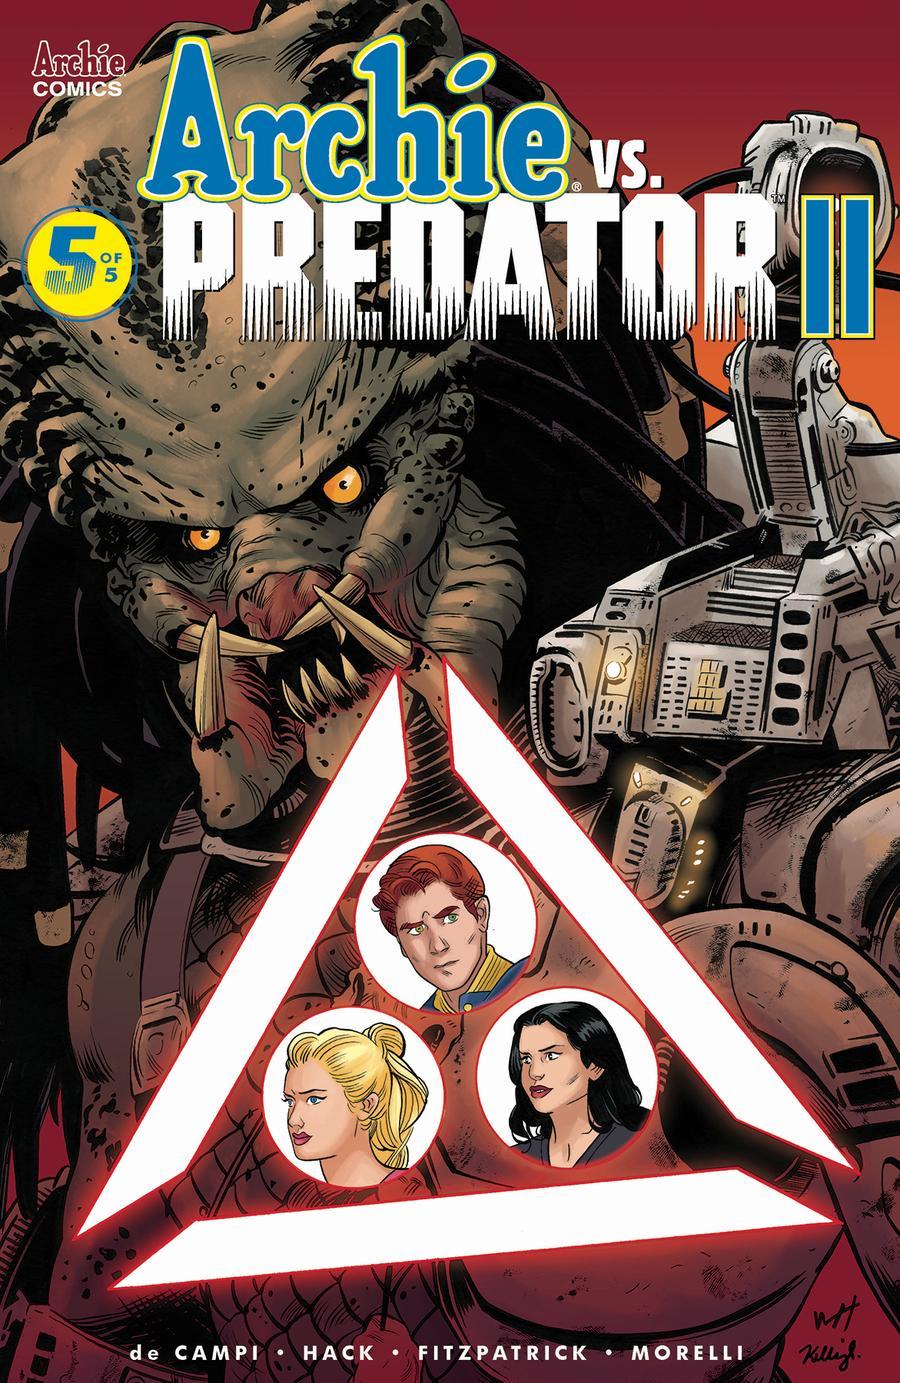 Archie vs Predator II #5 Cover F Variant Wilfredo Torres & Kelly Fitzpatrick Cover